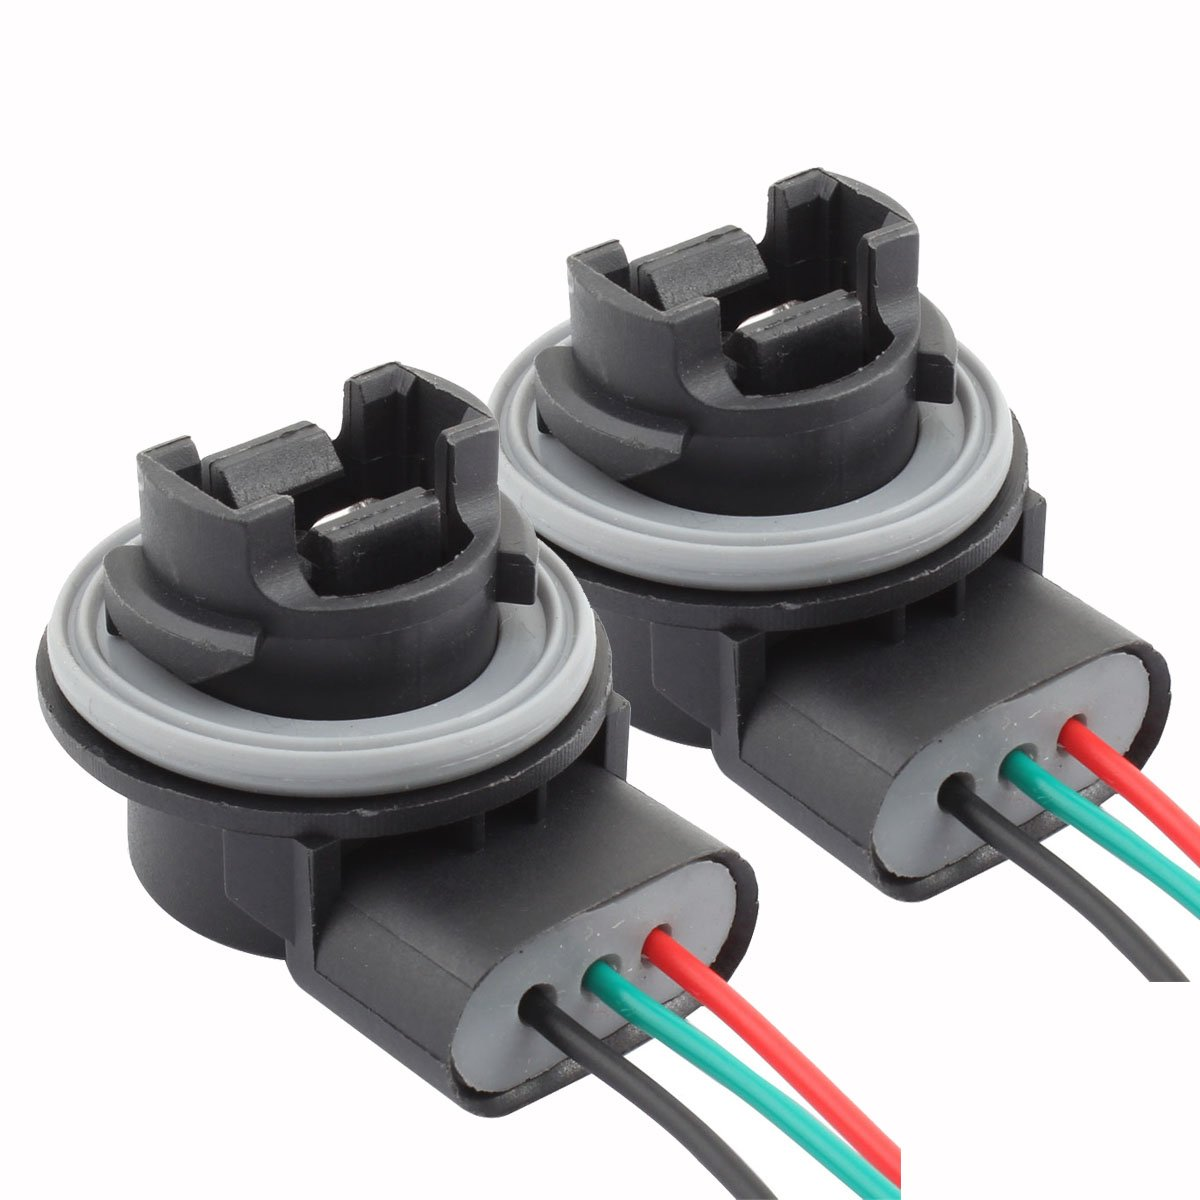 Tomall 3157 T25 Bulb Sockets Female Adapter For Socket Wiring Diagram Automotive Light Bulbs Brake Lightpack Of 2 Tabs